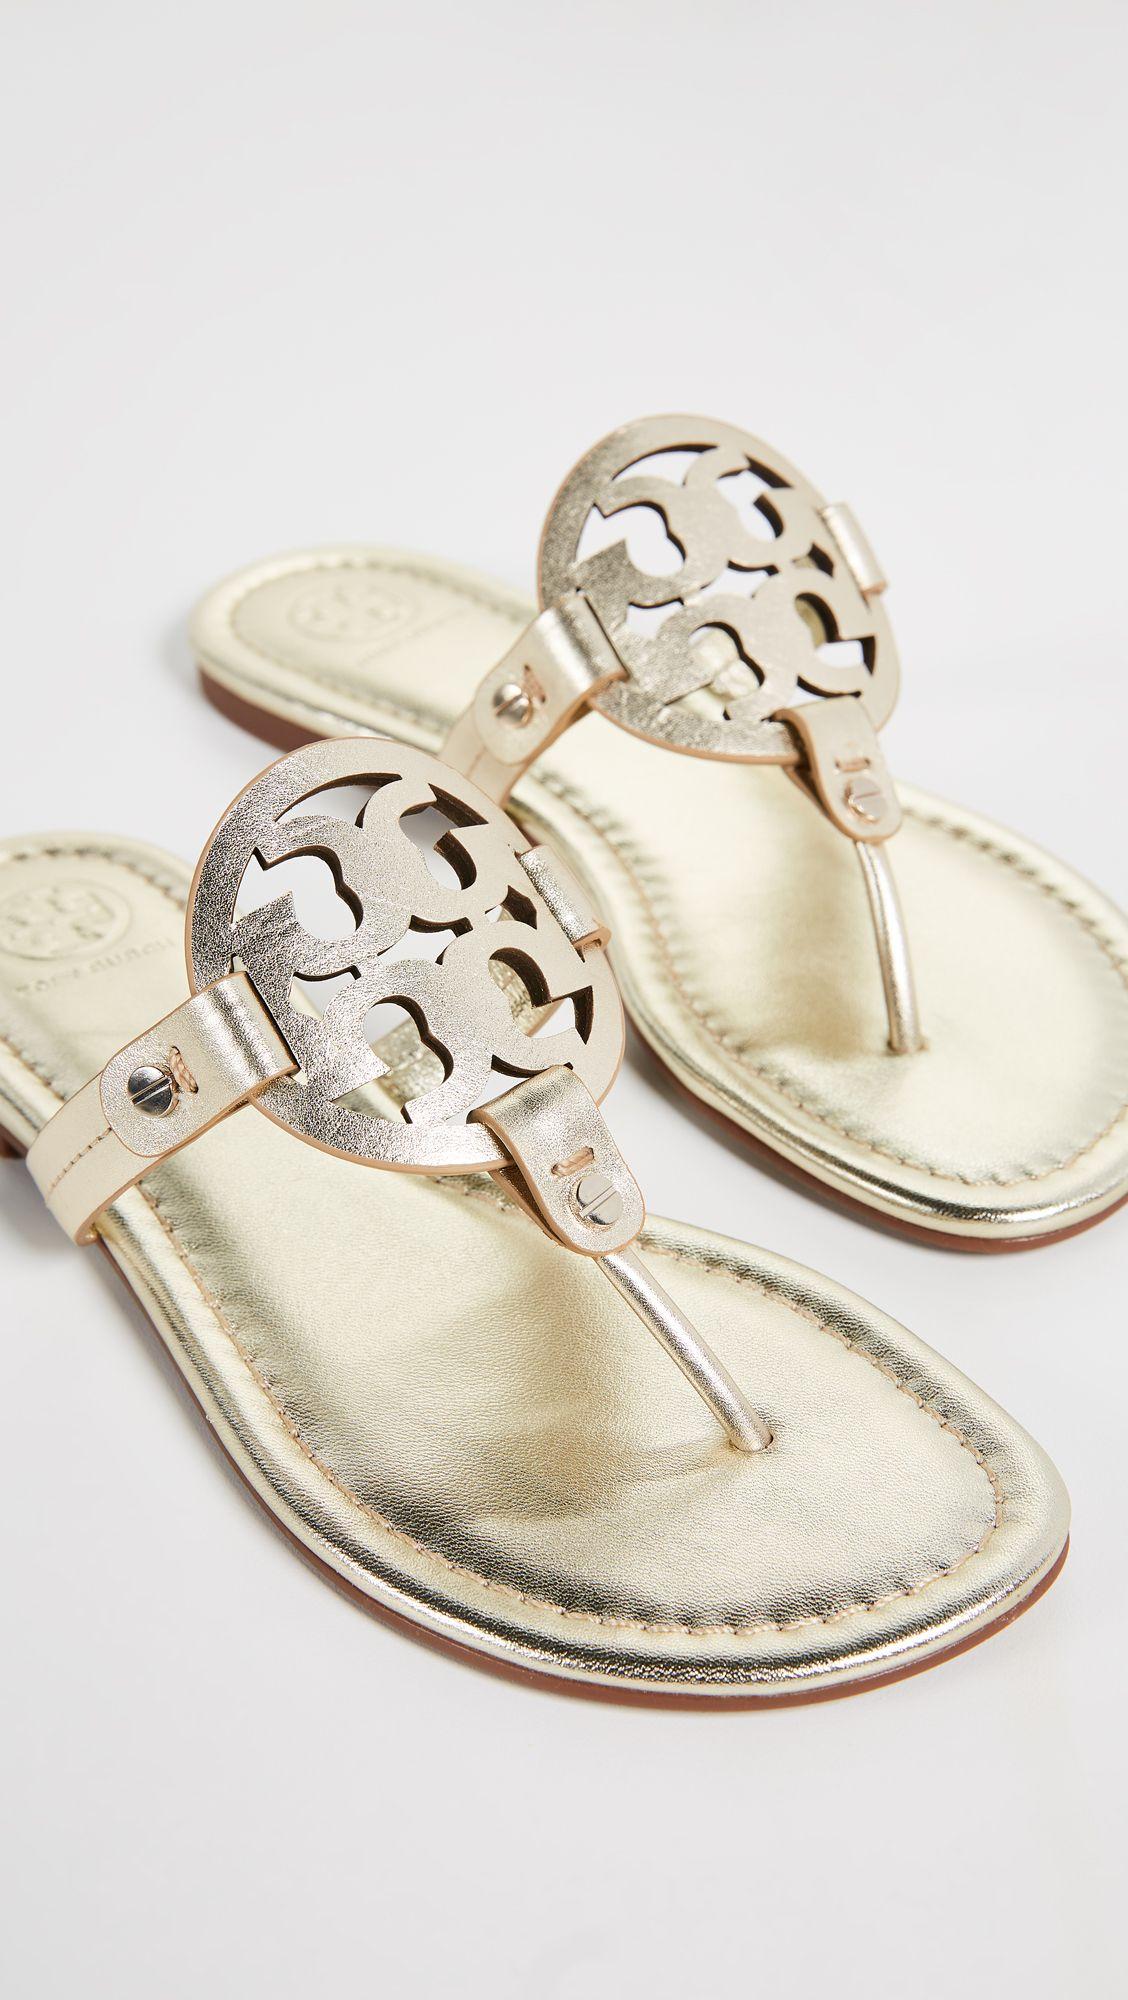 b2af0adc514 Tory Burch Miller Thong Sandals